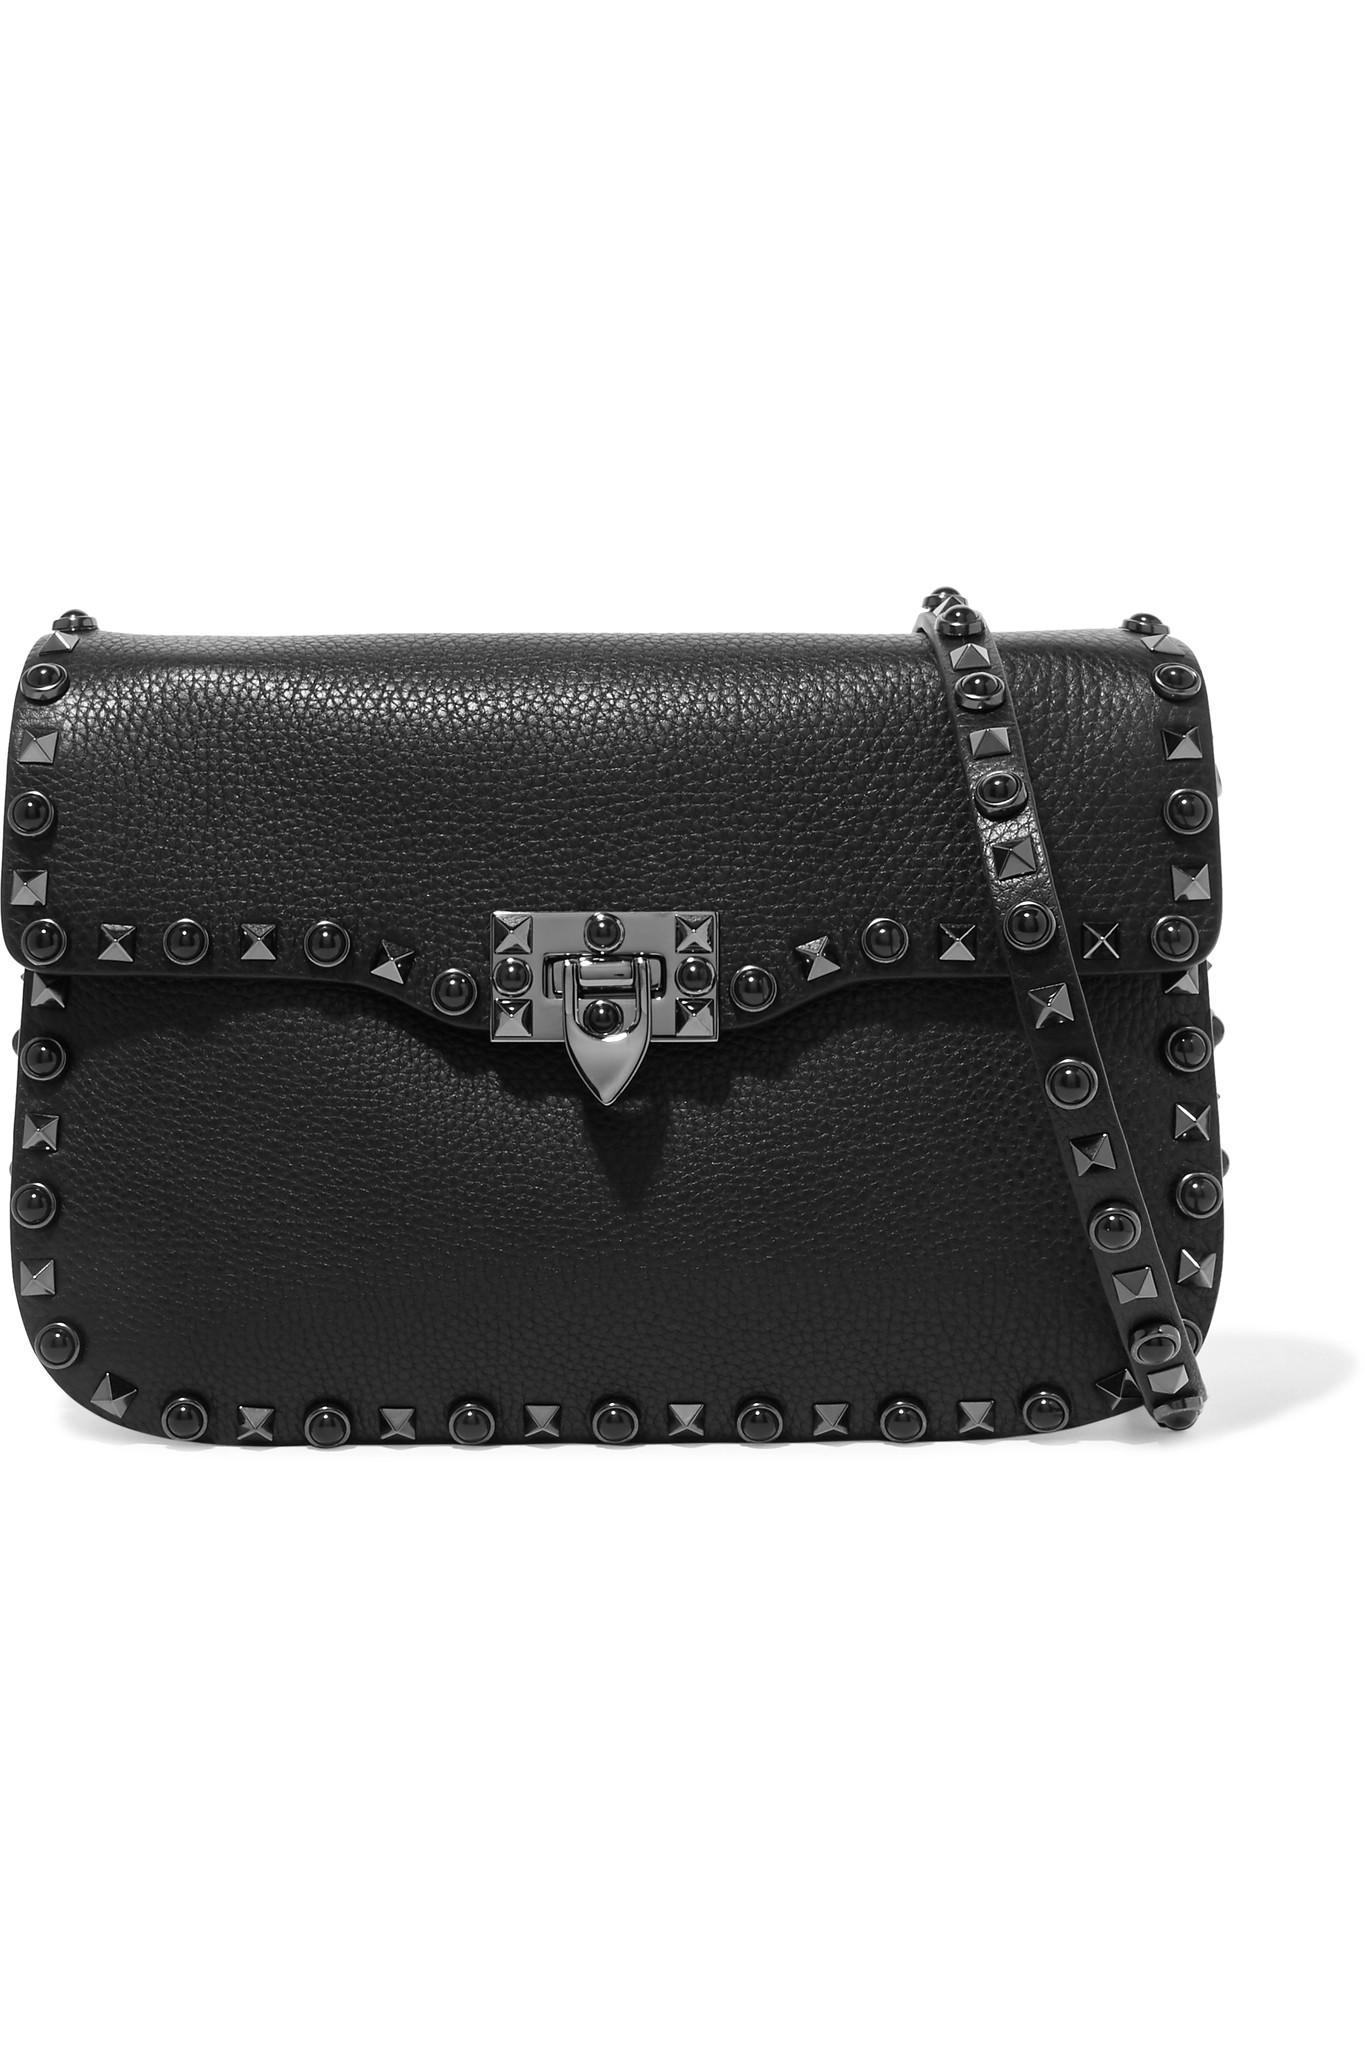 c4bf4f777e Valentino. Women s Black Garavani The Rockstud Rolling Textured-leather  Shoulder Bag